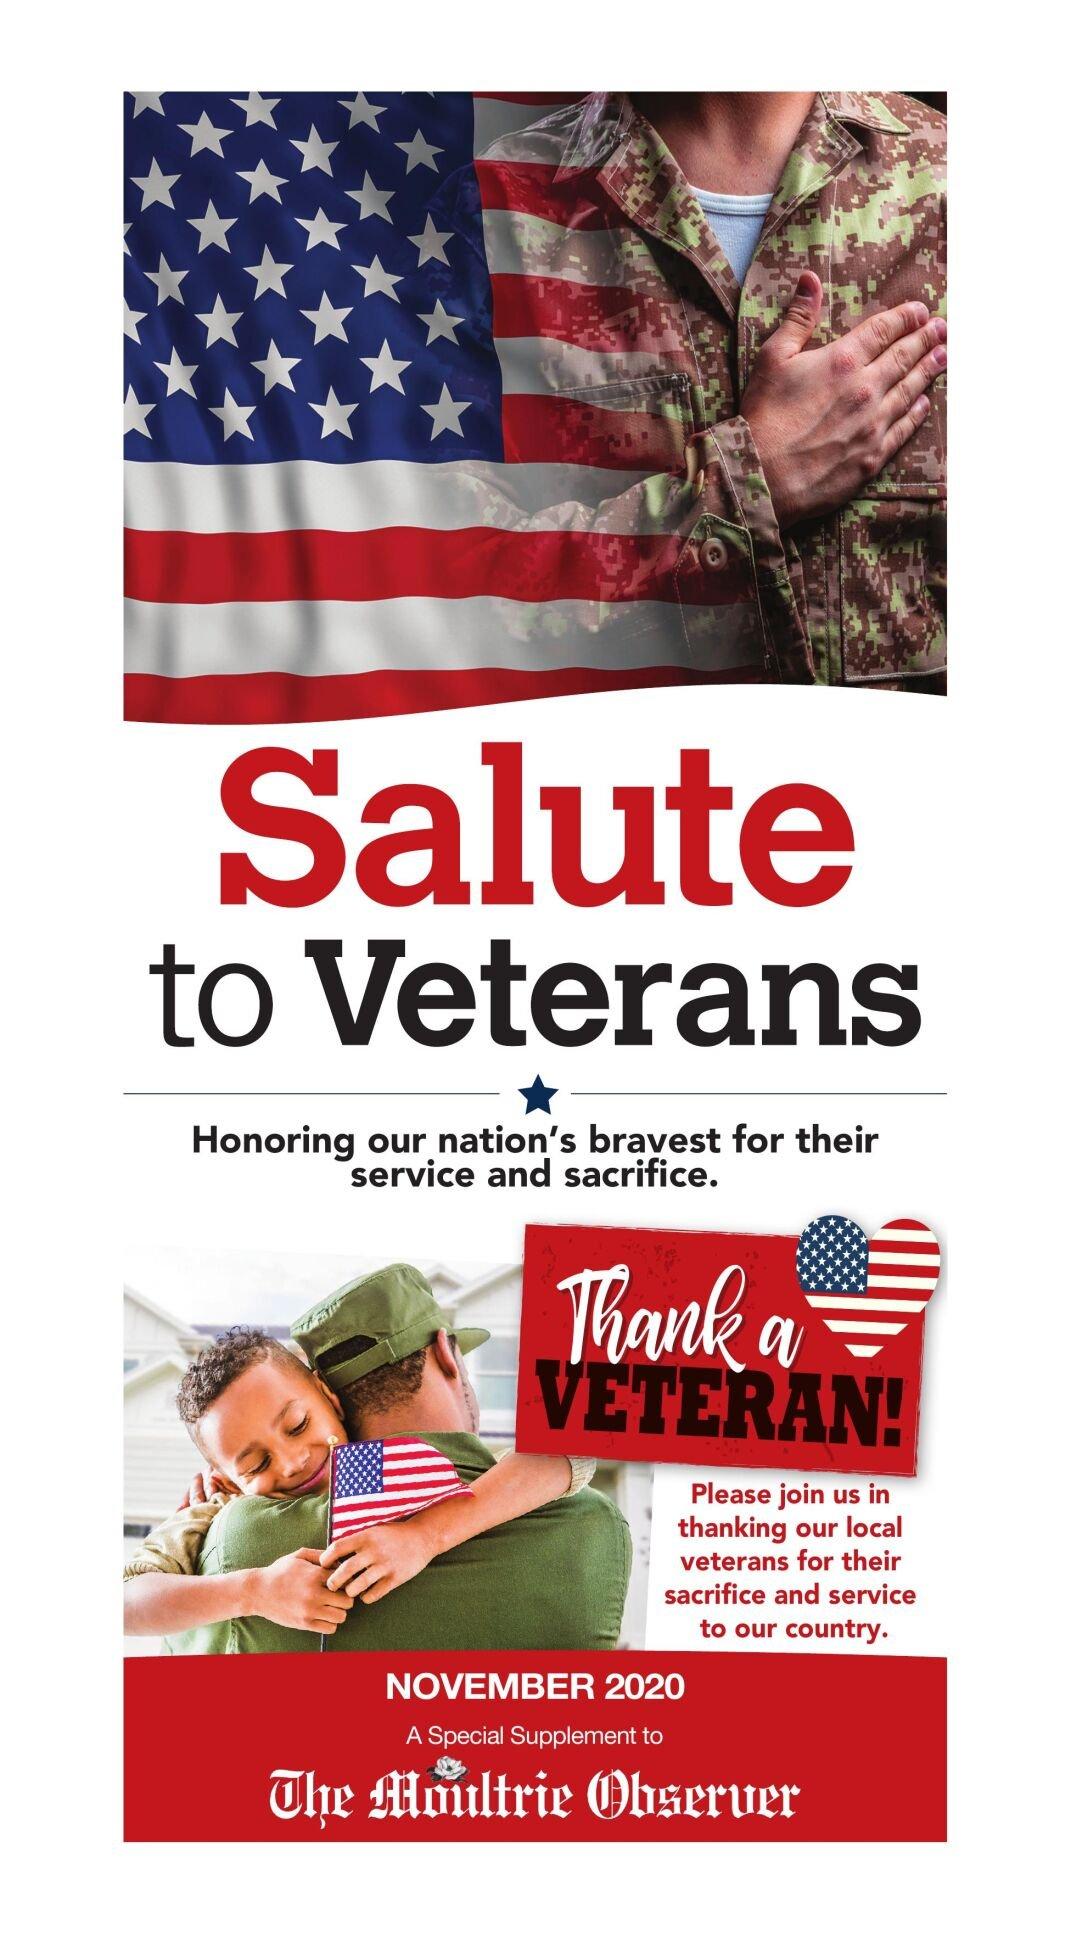 Salute to Veterans, 2020